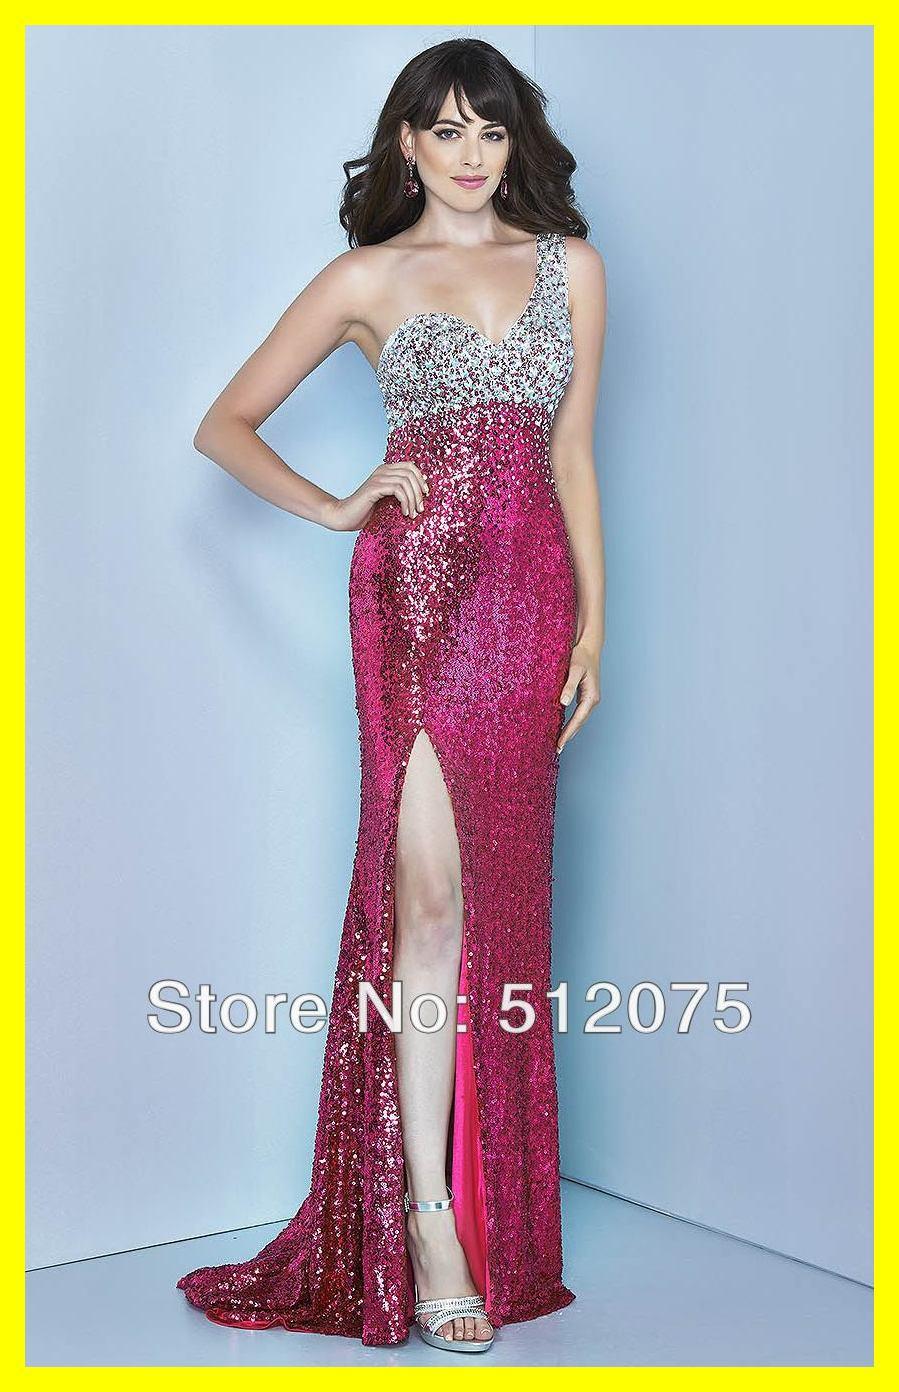 Cheap prom dresses websites